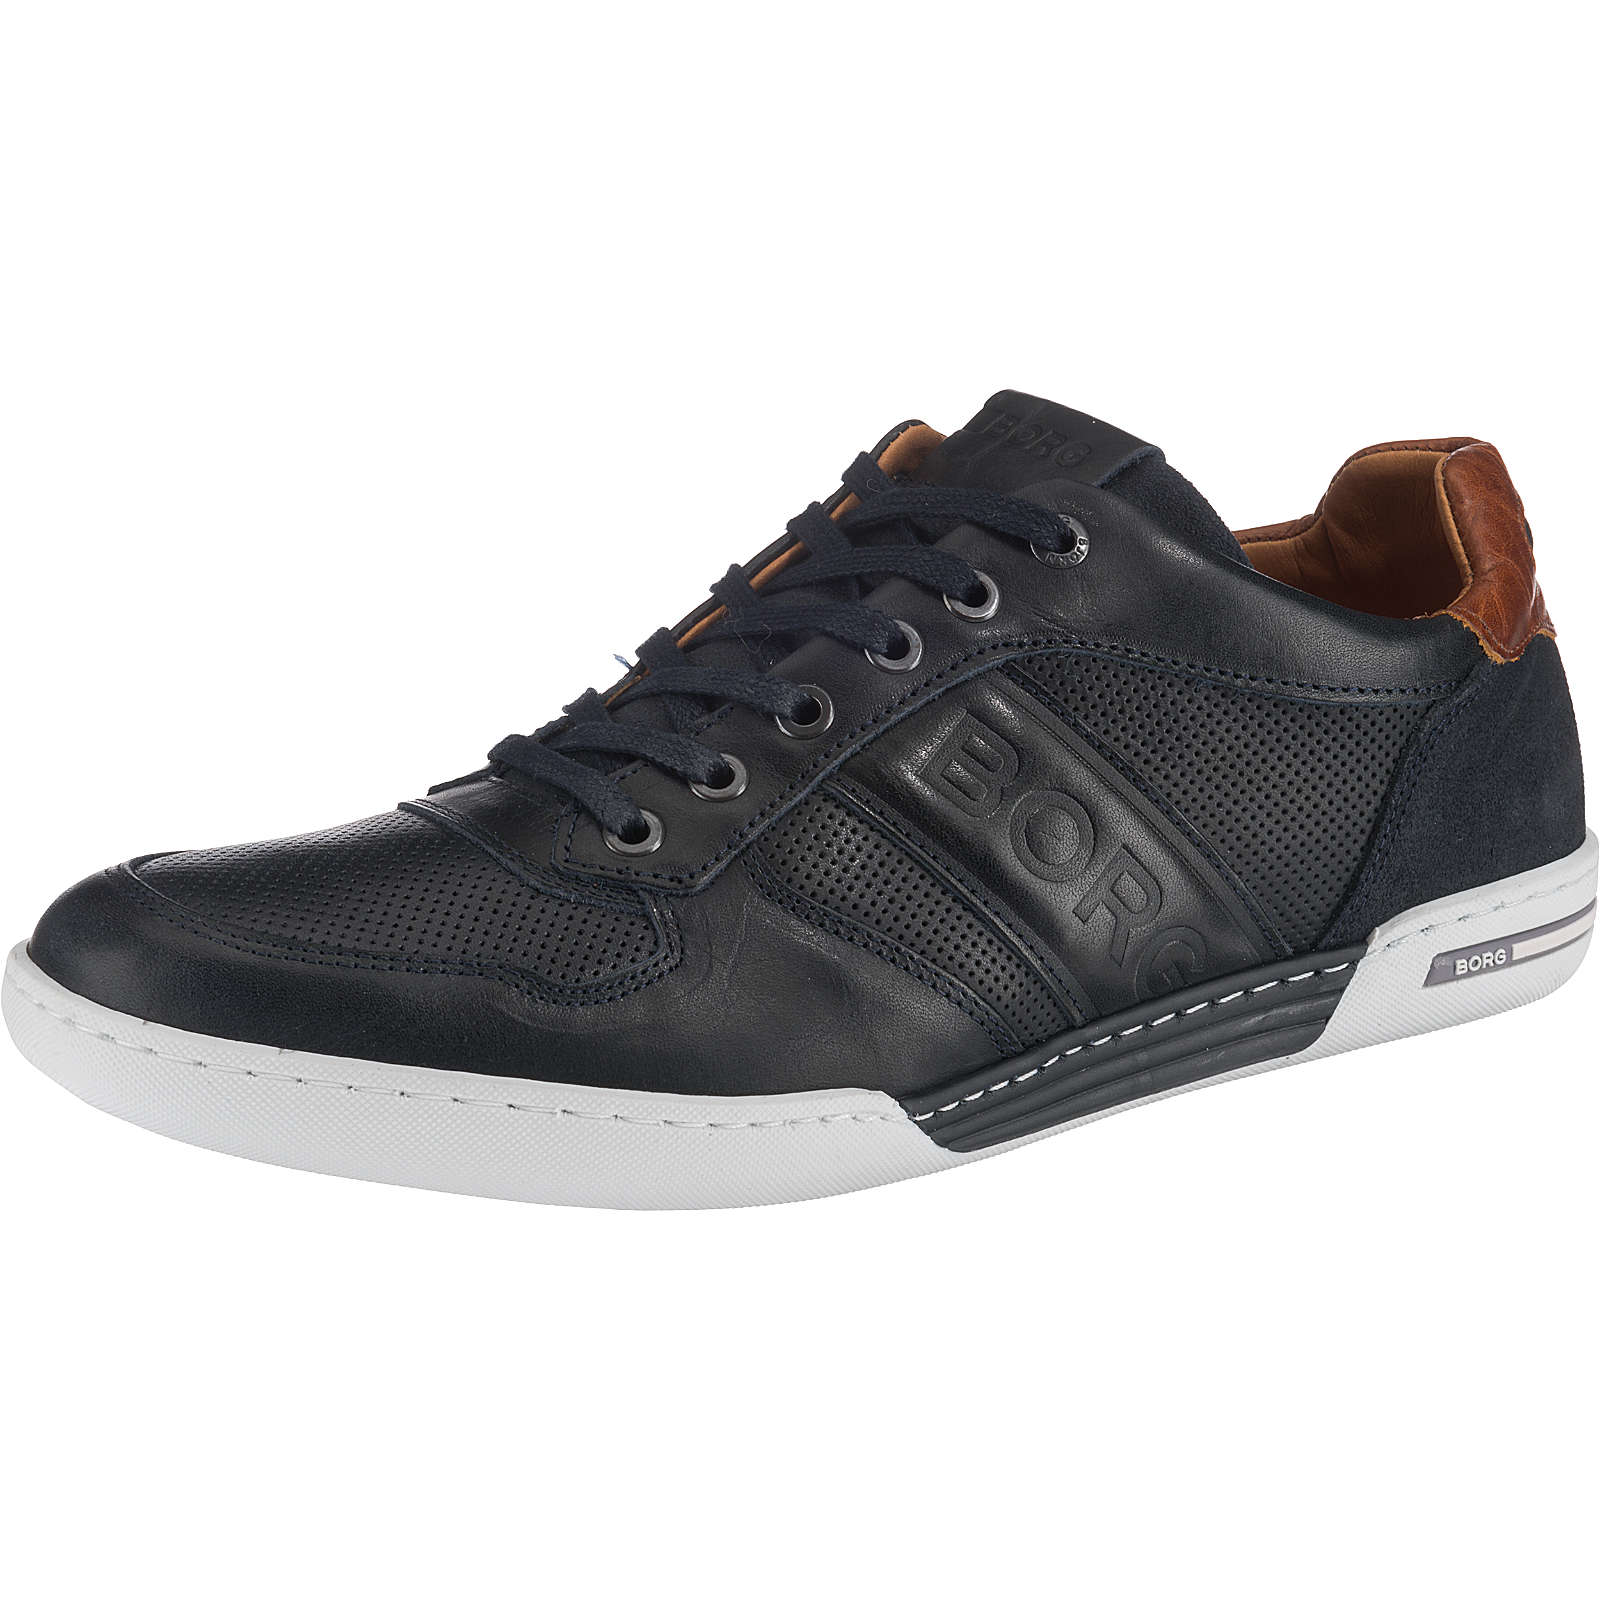 BJÖRN BORG Sneakers Low dunkelblau Herren Gr. 41